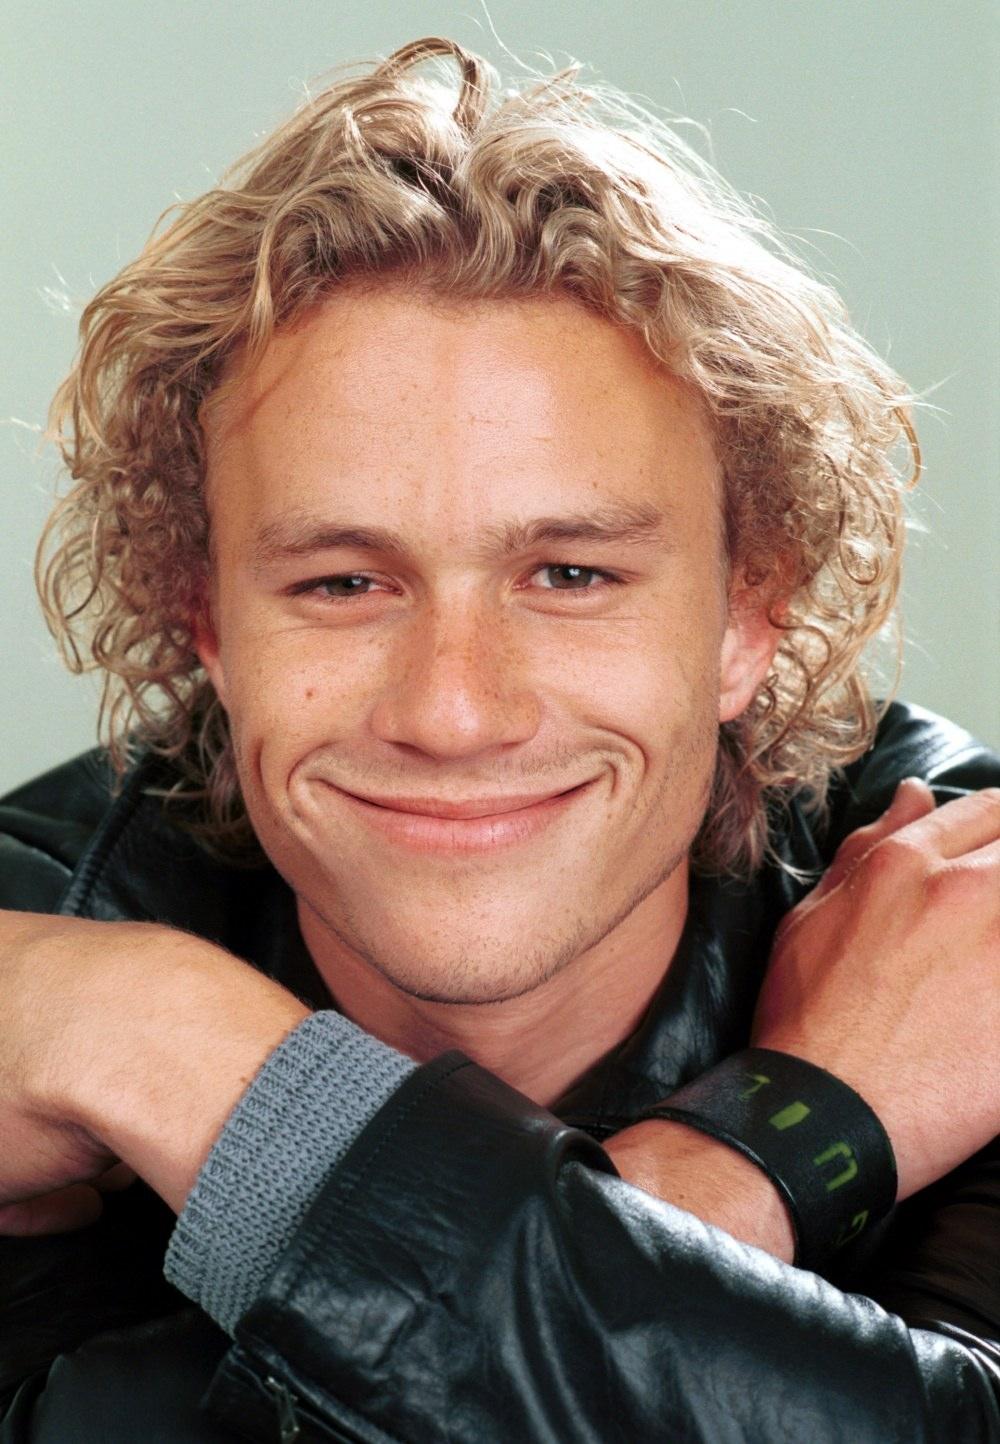 Amazing Heath Ledger Pictures & Backgrounds